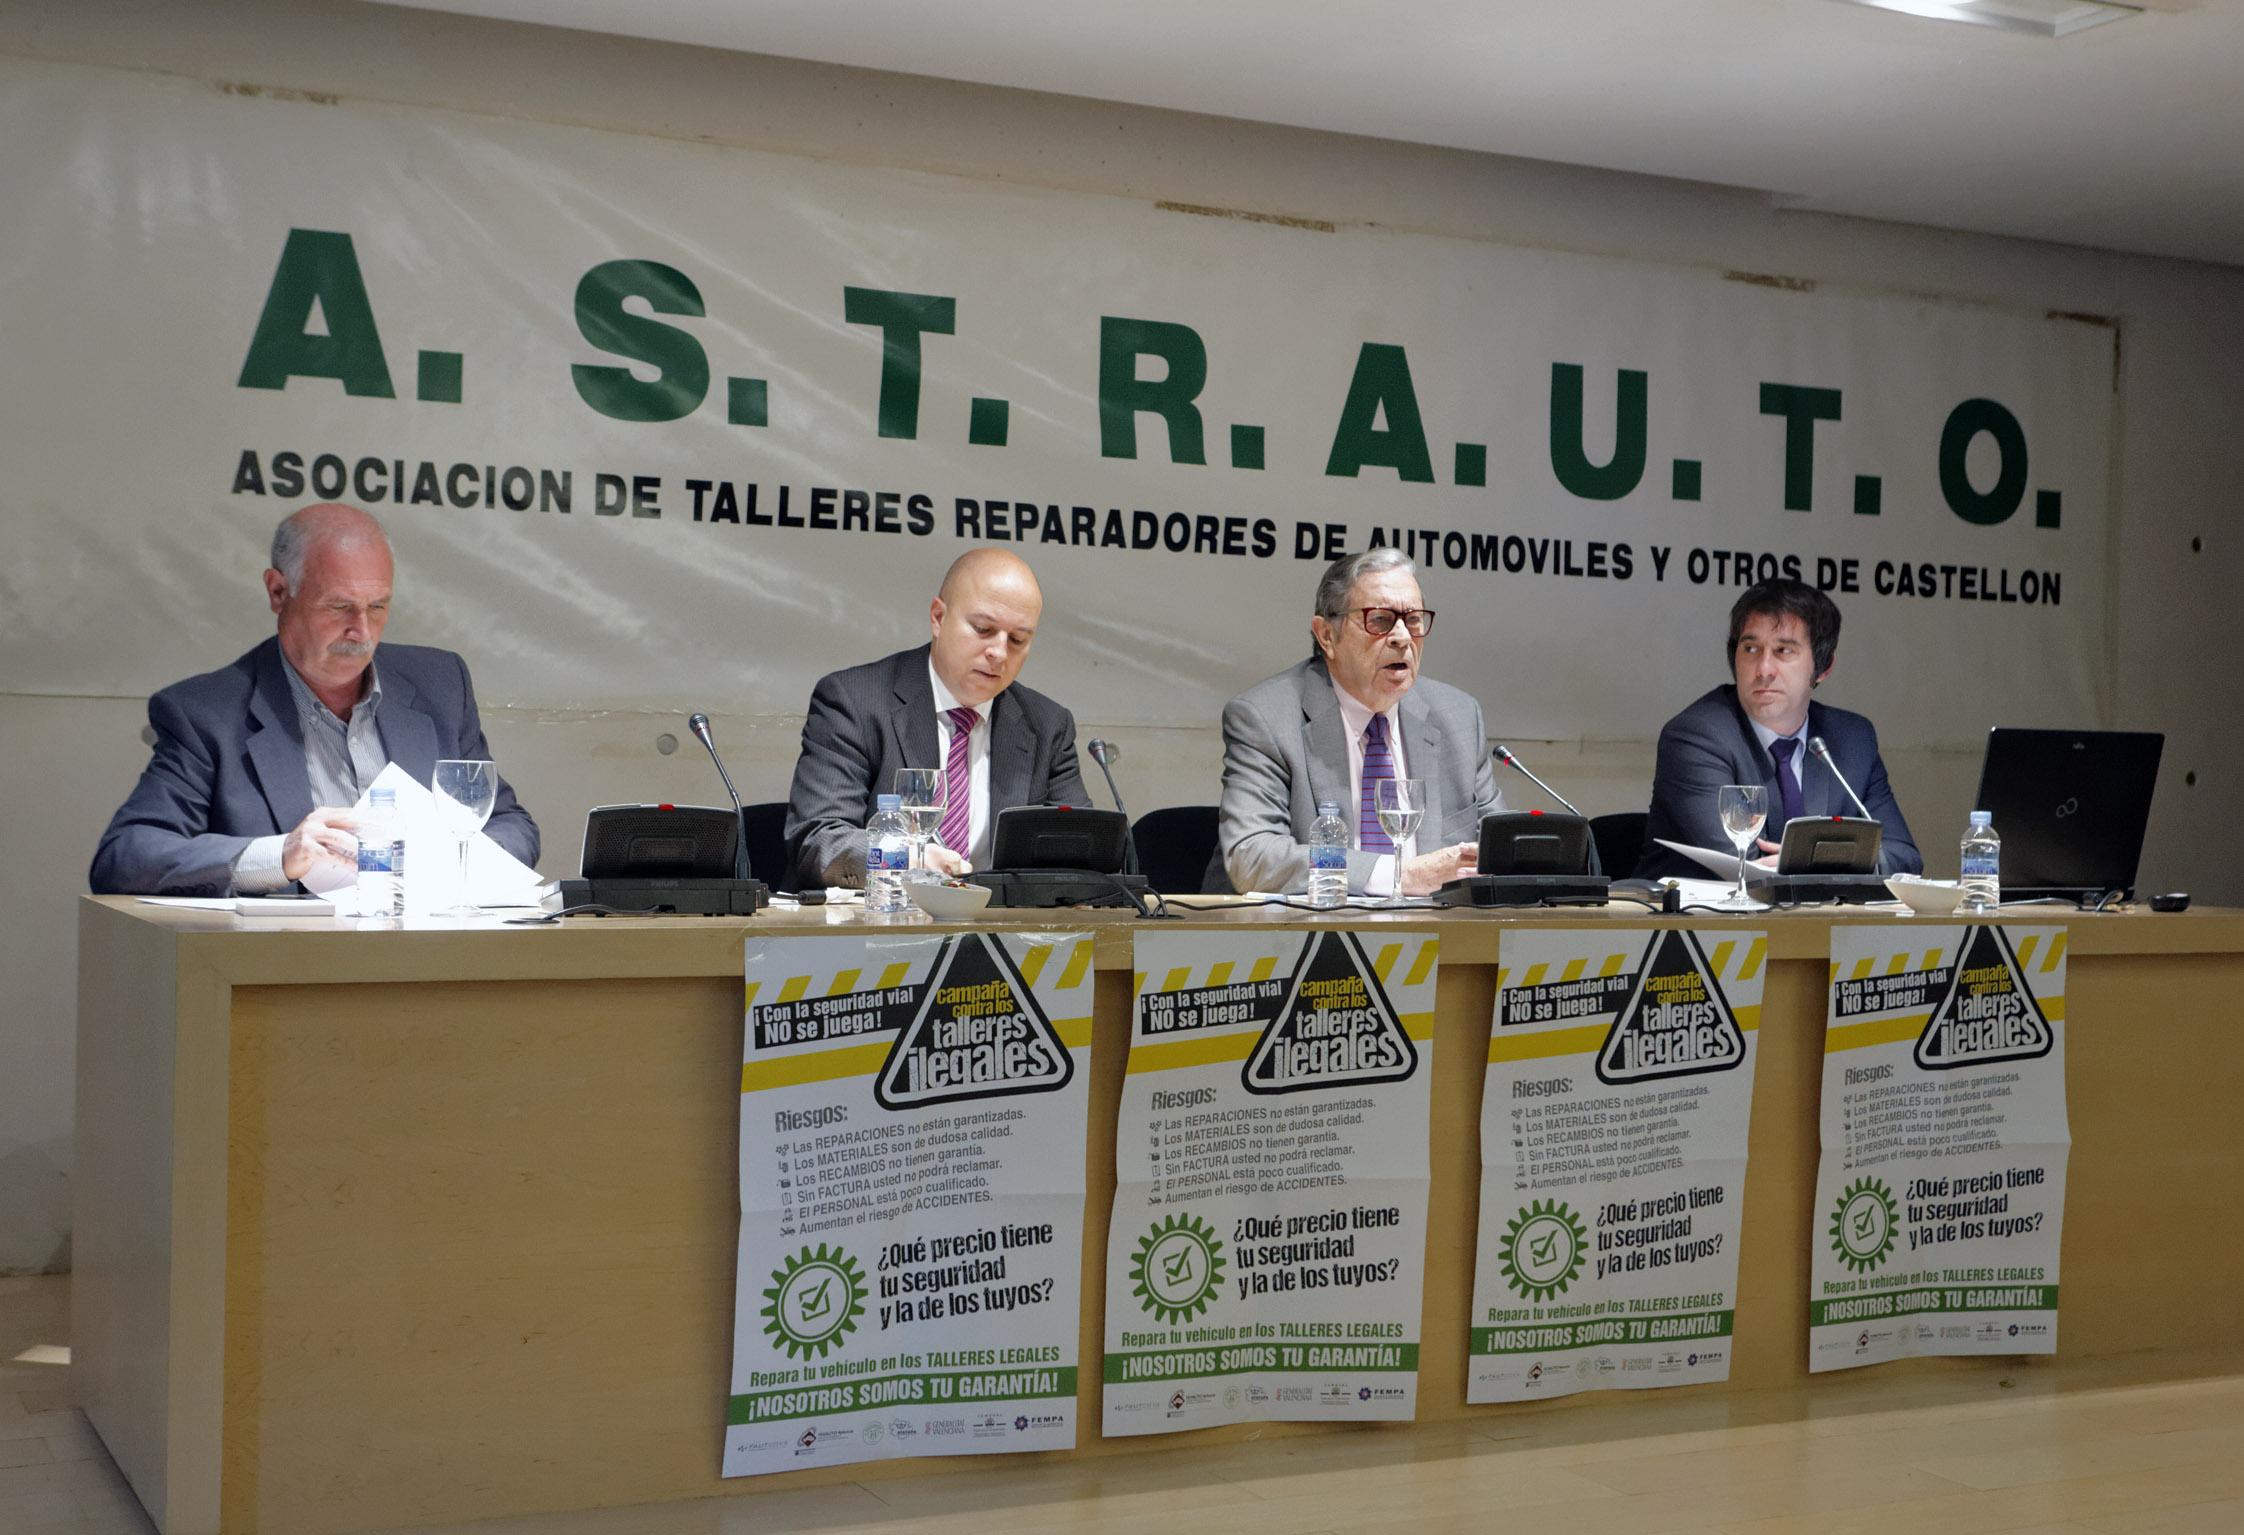 Asamblea General 2014 de Astrauto